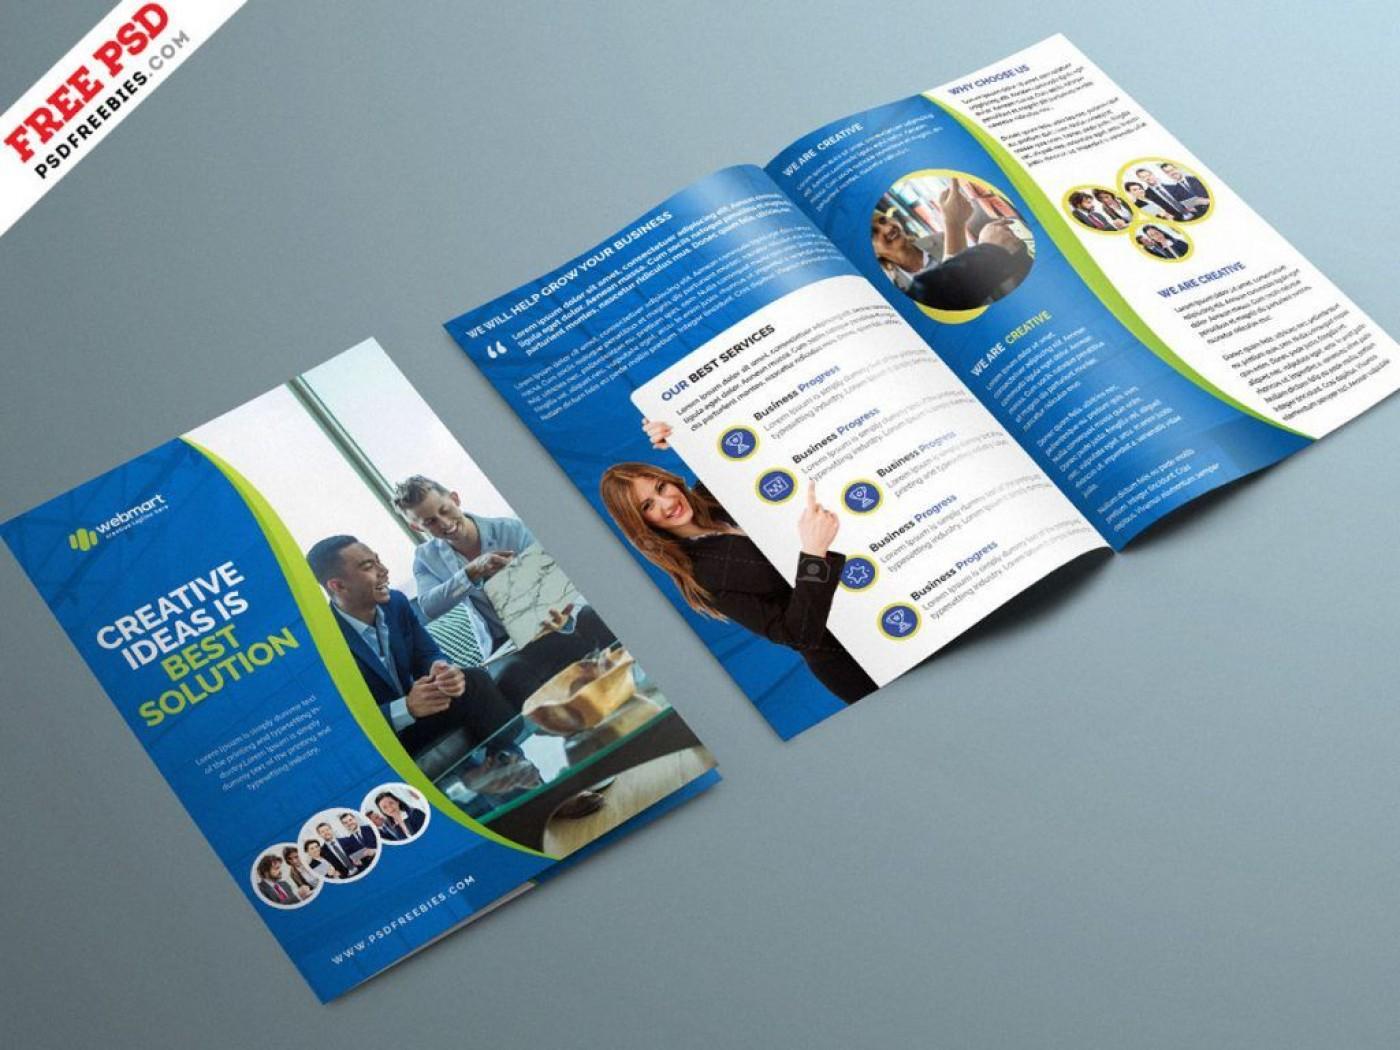 004 Unusual Corporate Brochure Design Template Psd Free Download Example  Hotel1400